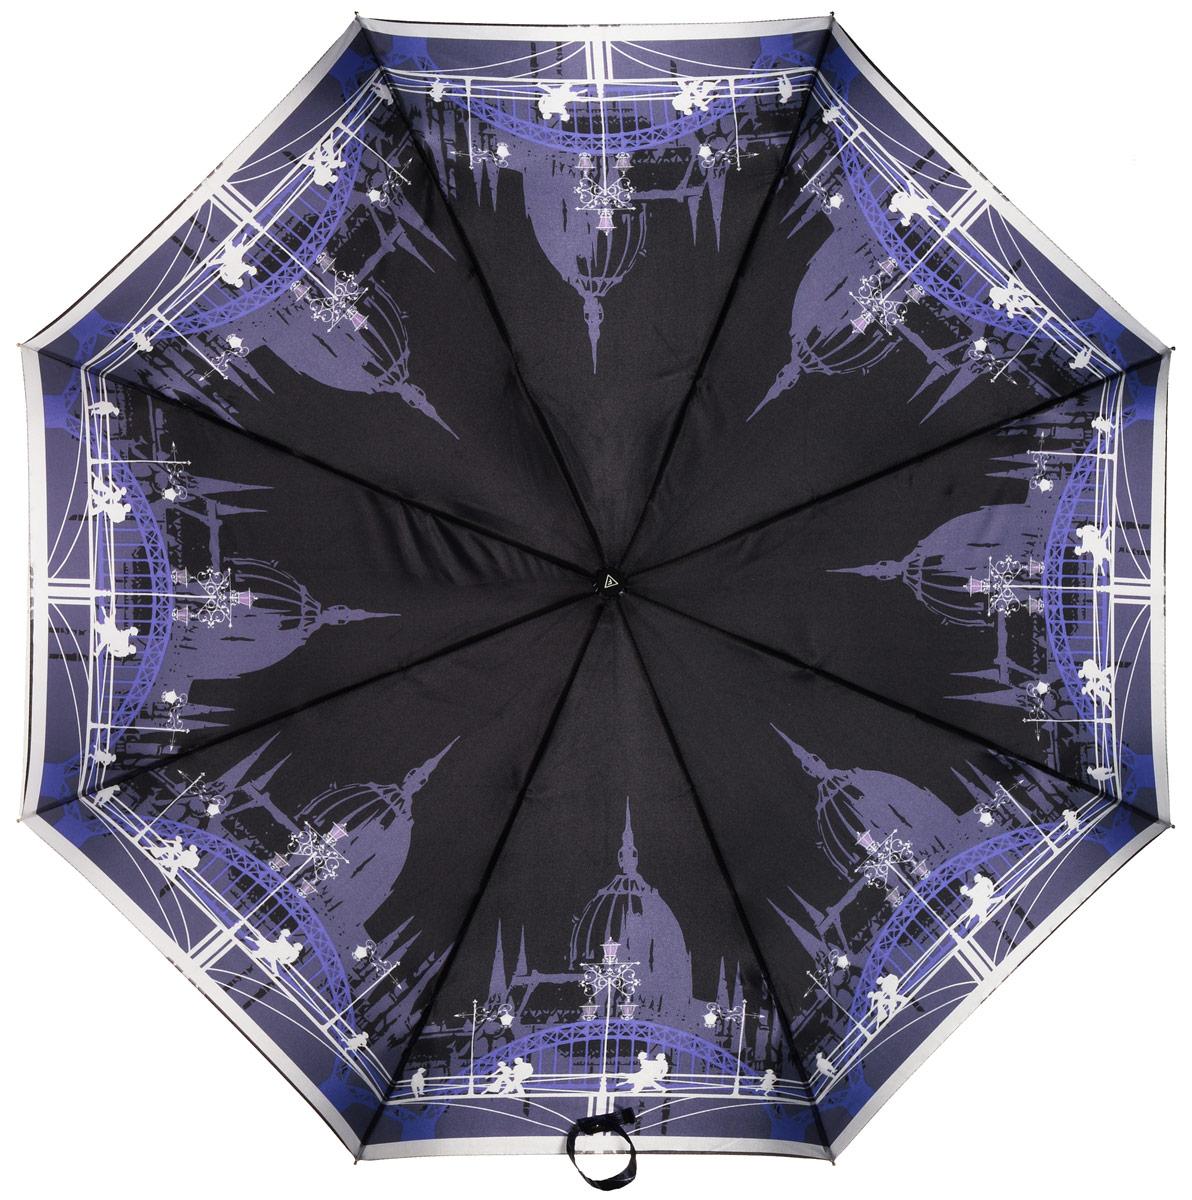 Зонт женский Fabretti, автомат, 3 сложения, цвет: мультиколор. L-16106-13L-16106-13Зонт женский Fabretti, облегченный суперавтомат, 3 сложения